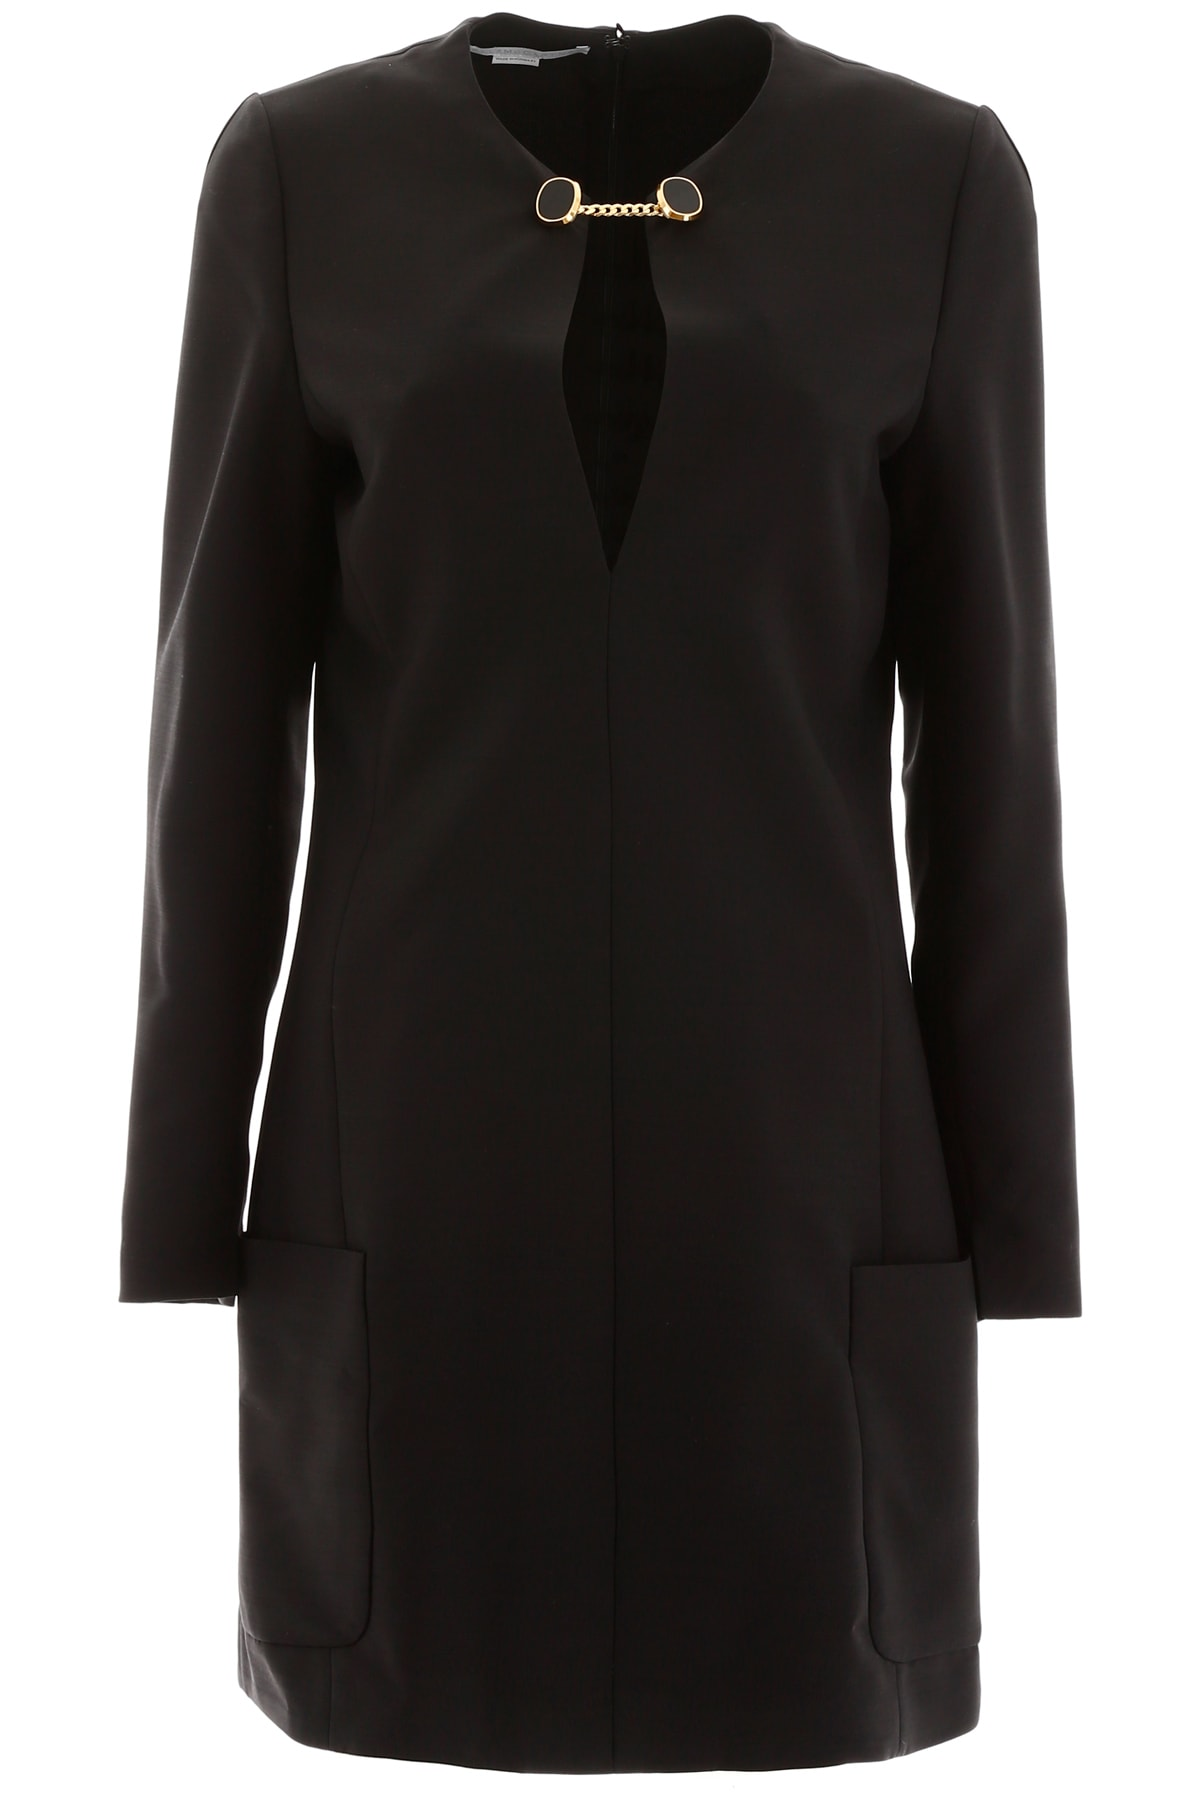 Buy Stella McCartney Crepe Mini Dress online, shop Stella McCartney with free shipping